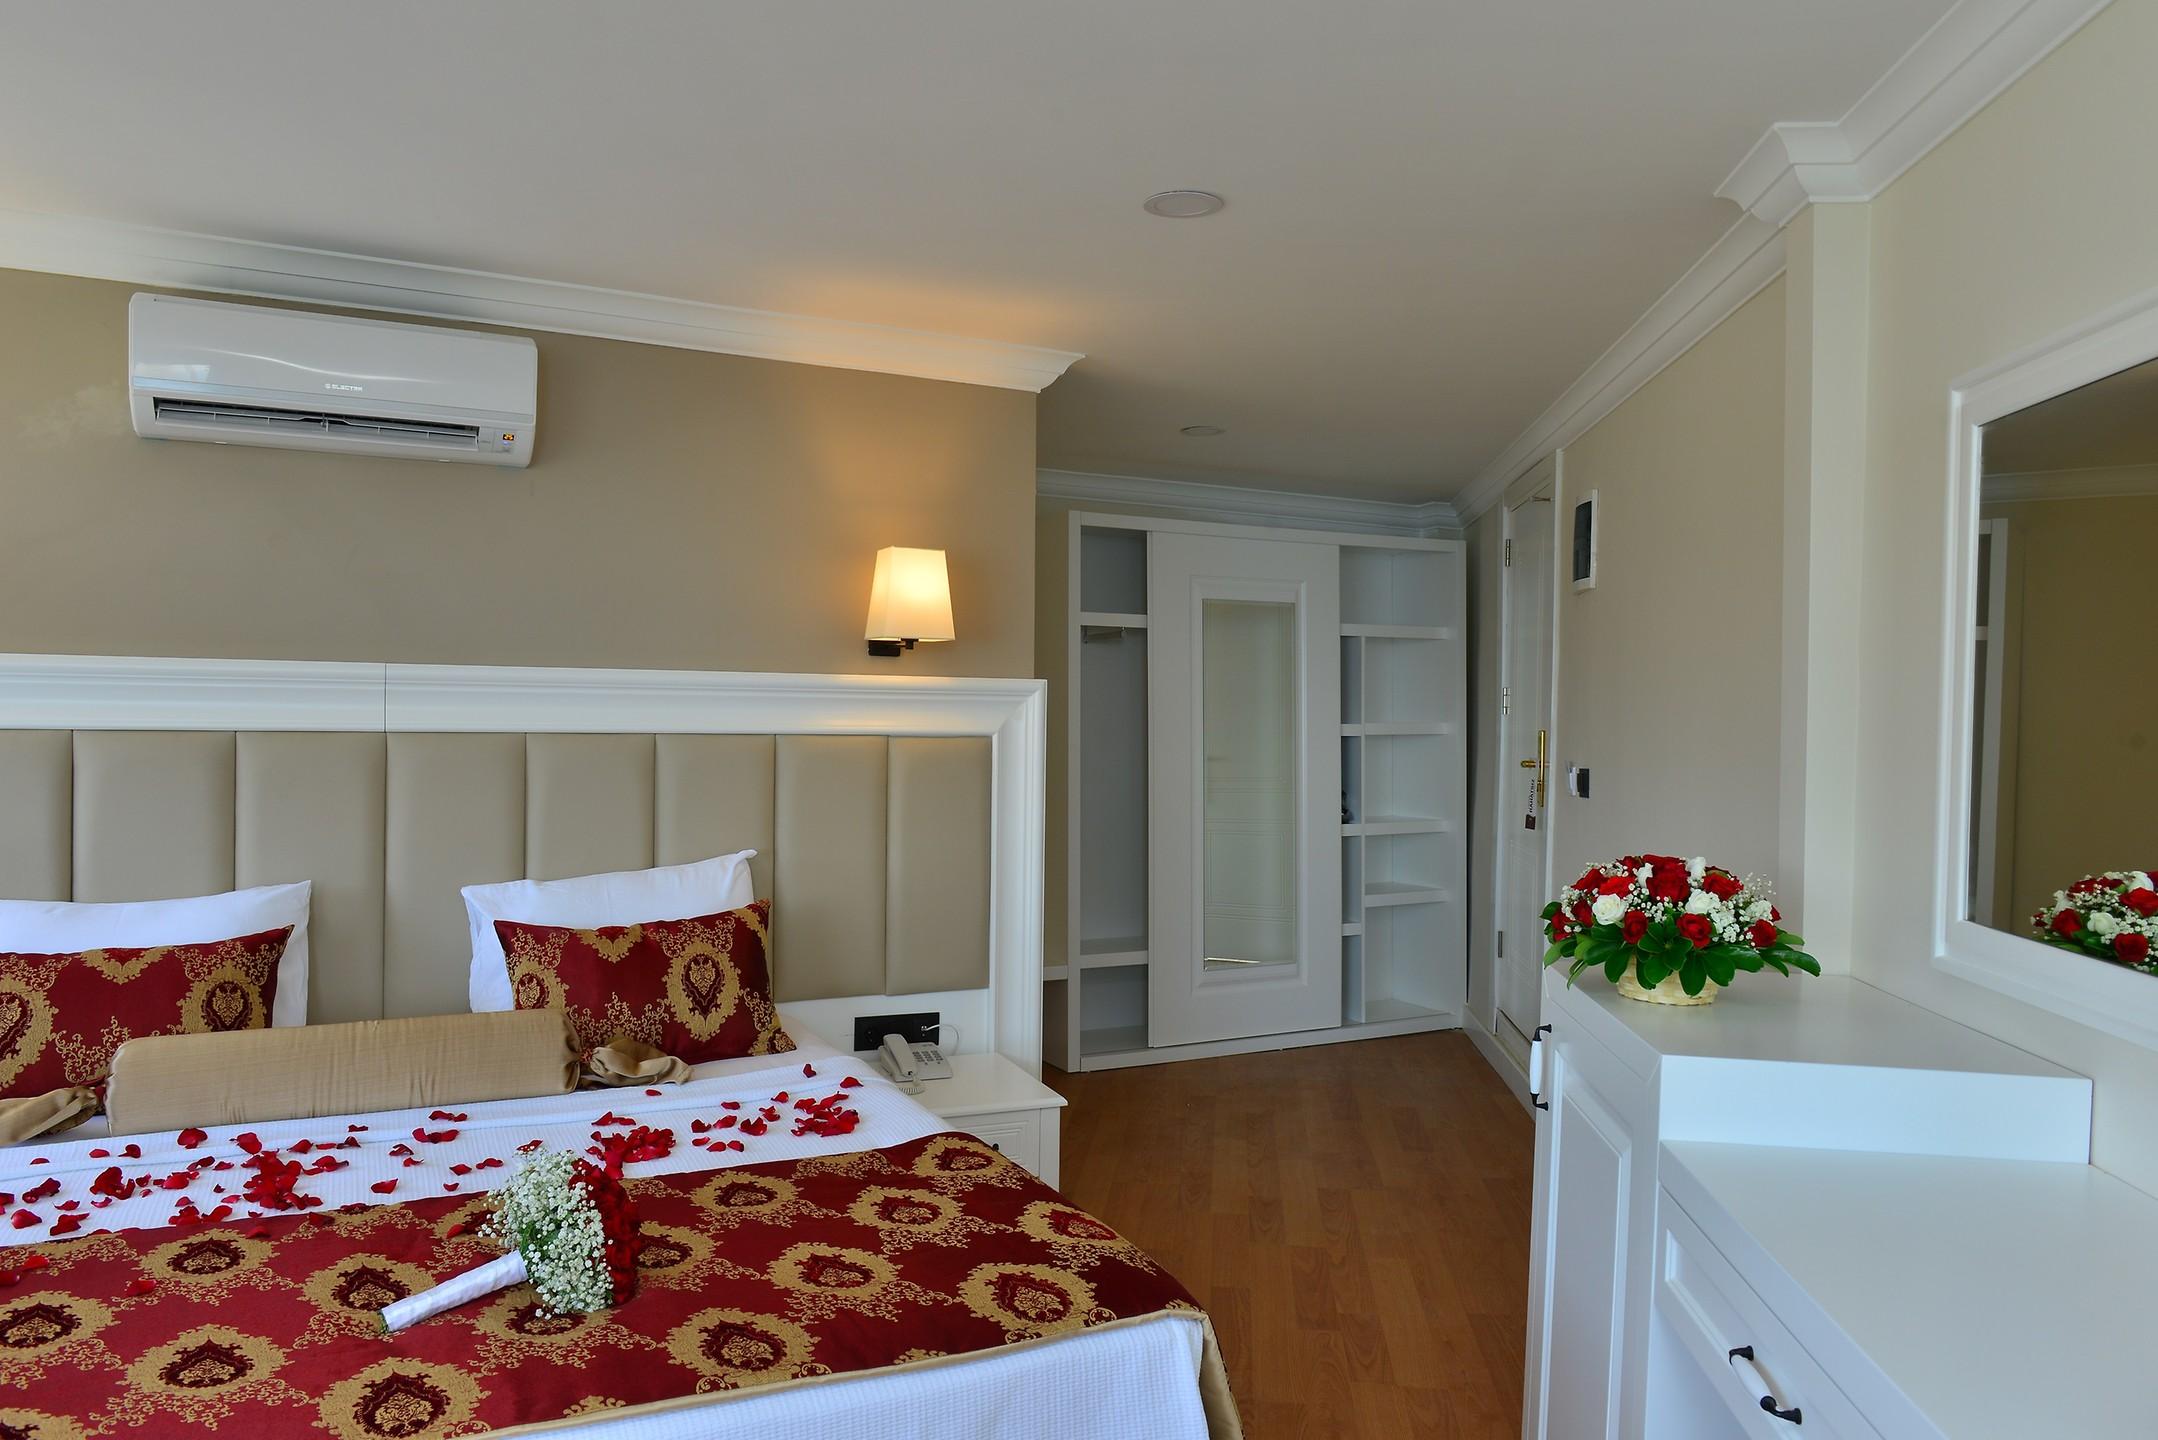 SEA STAR HOTEL261961